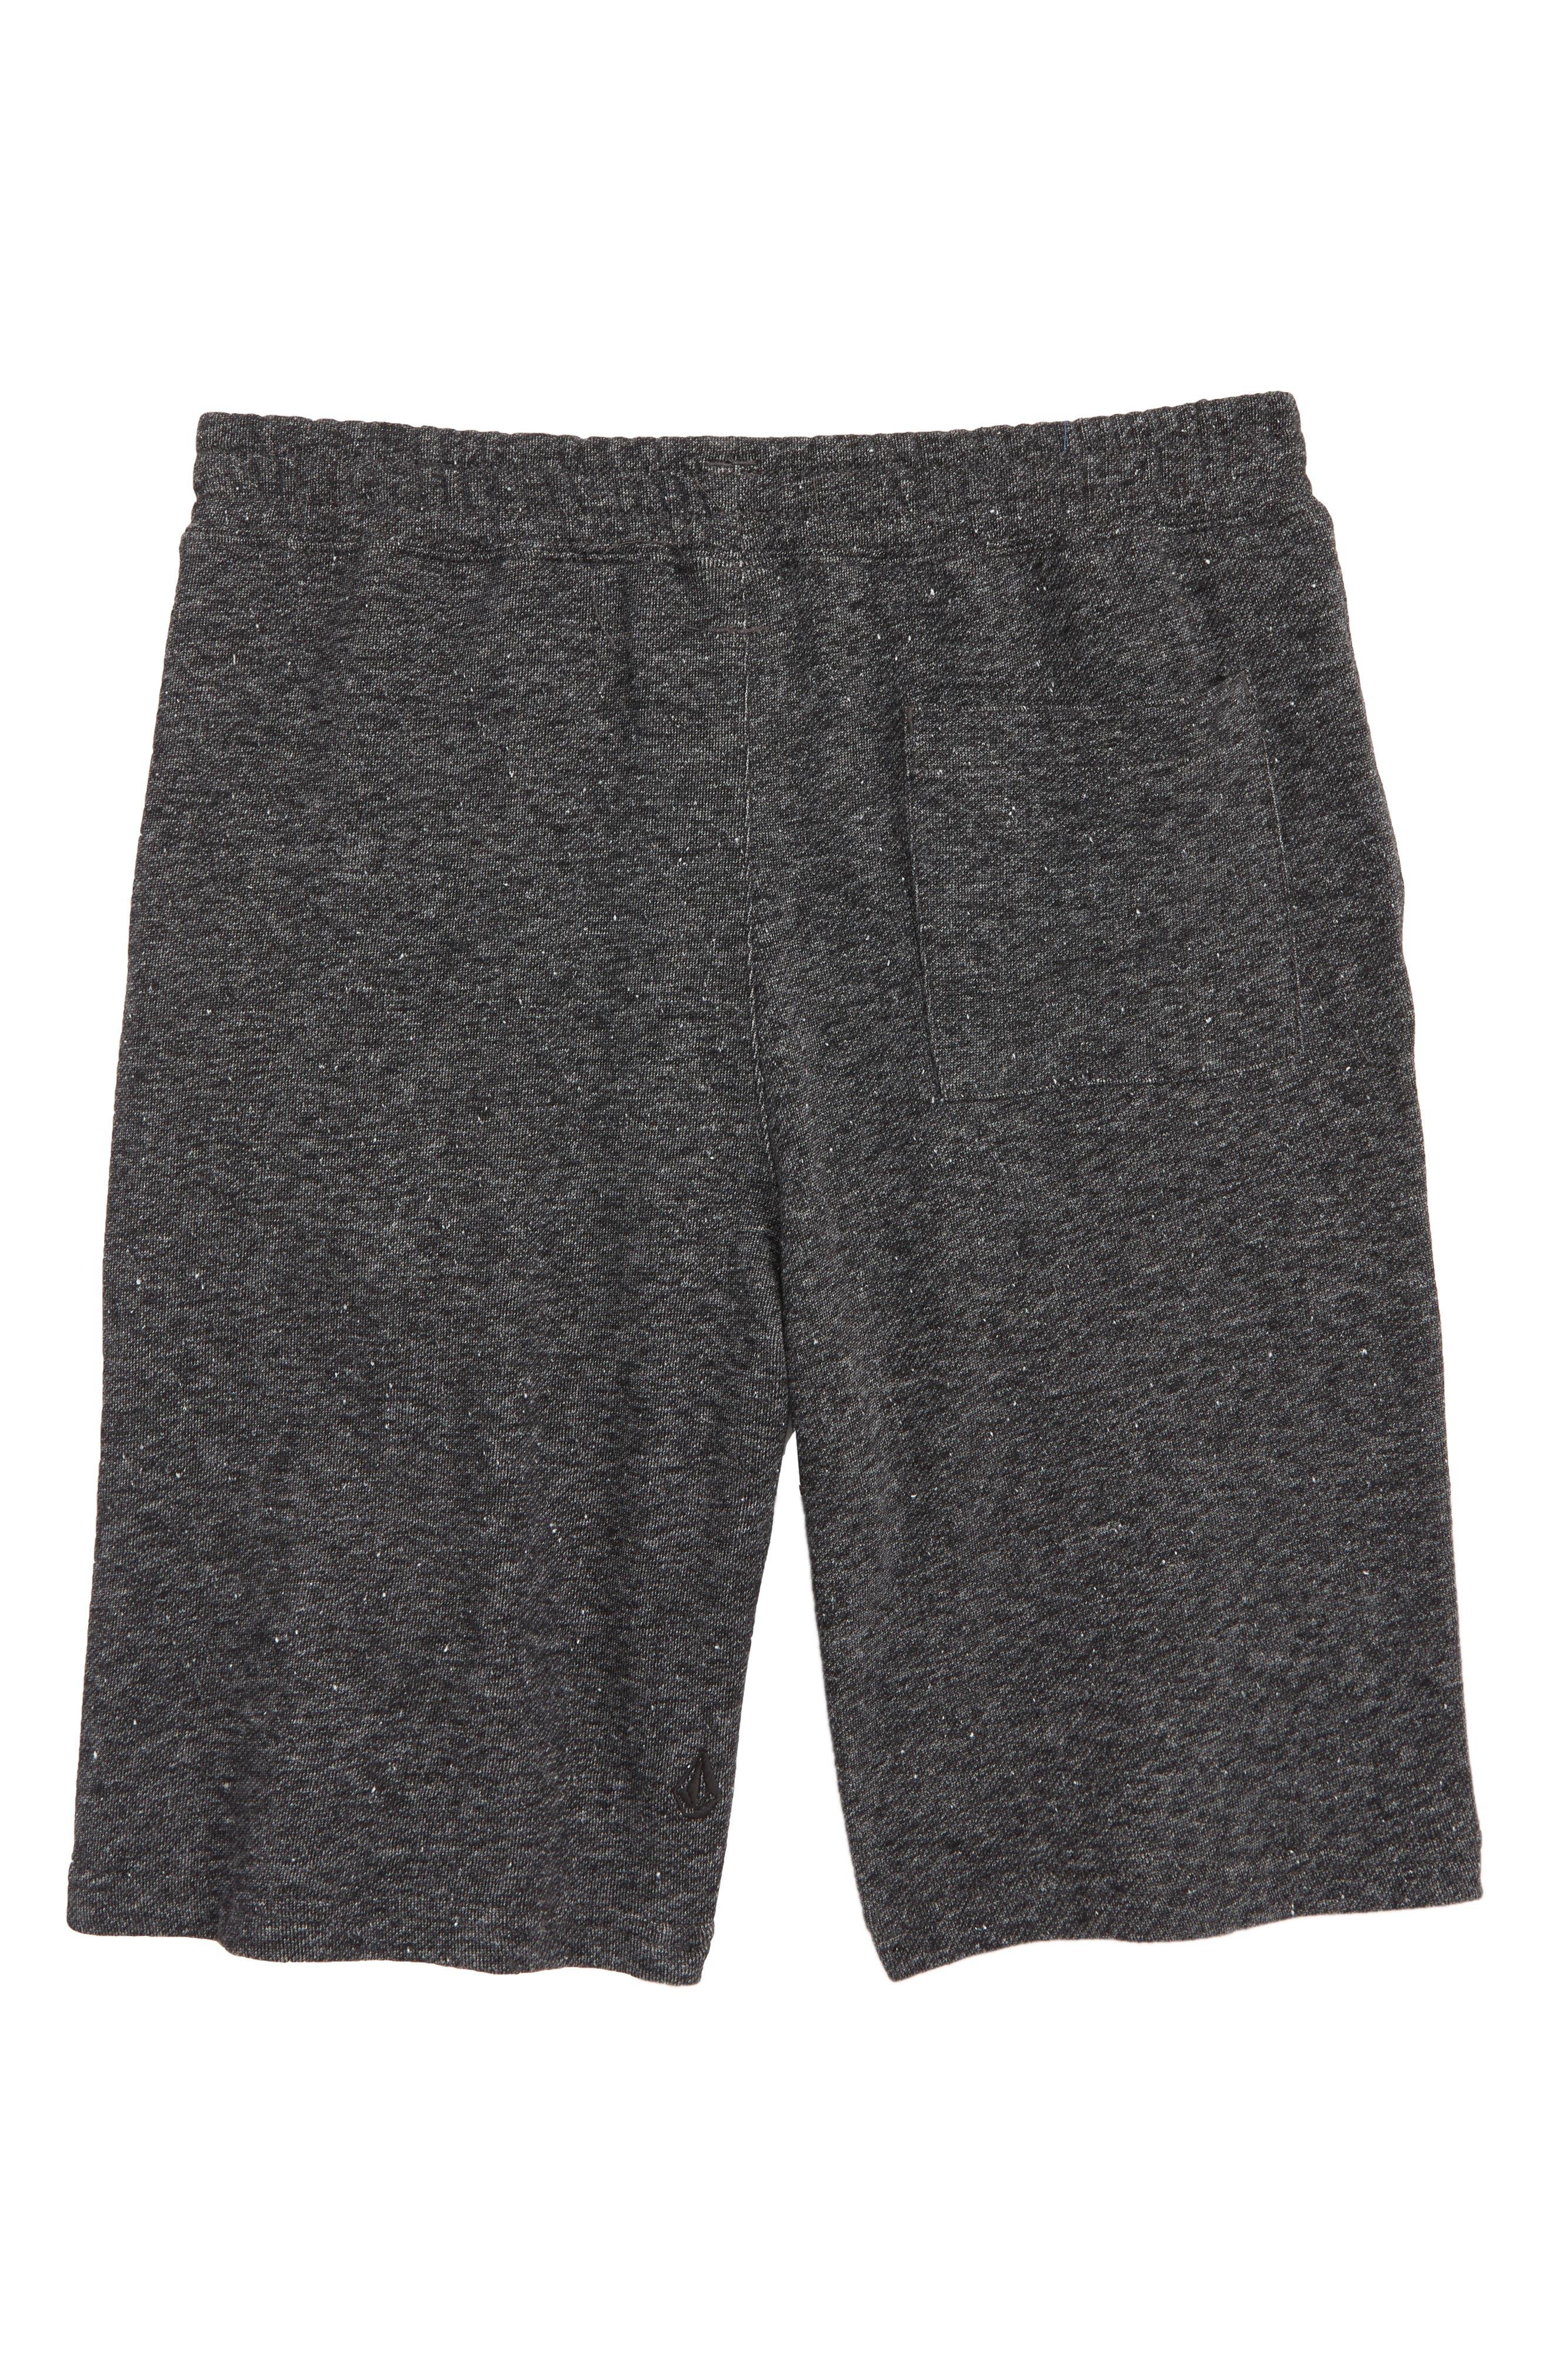 VOLCOM,                             Billing Shorts,                             Alternate thumbnail 2, color,                             001